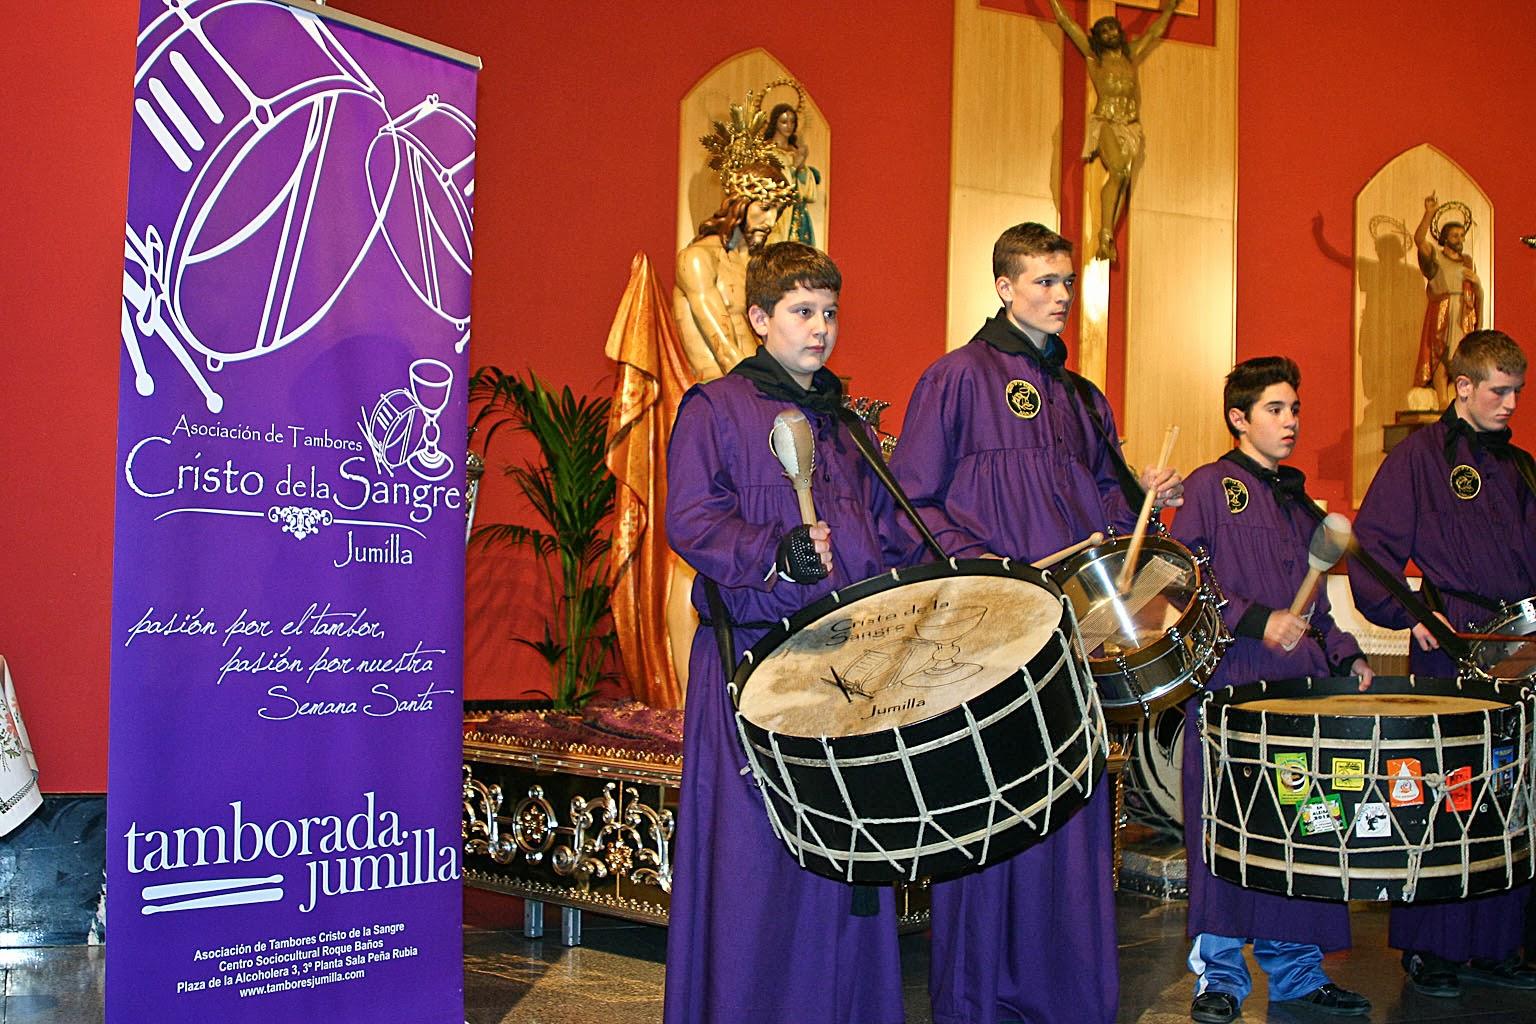 Semana Santa, Tamboradas, Jumilla